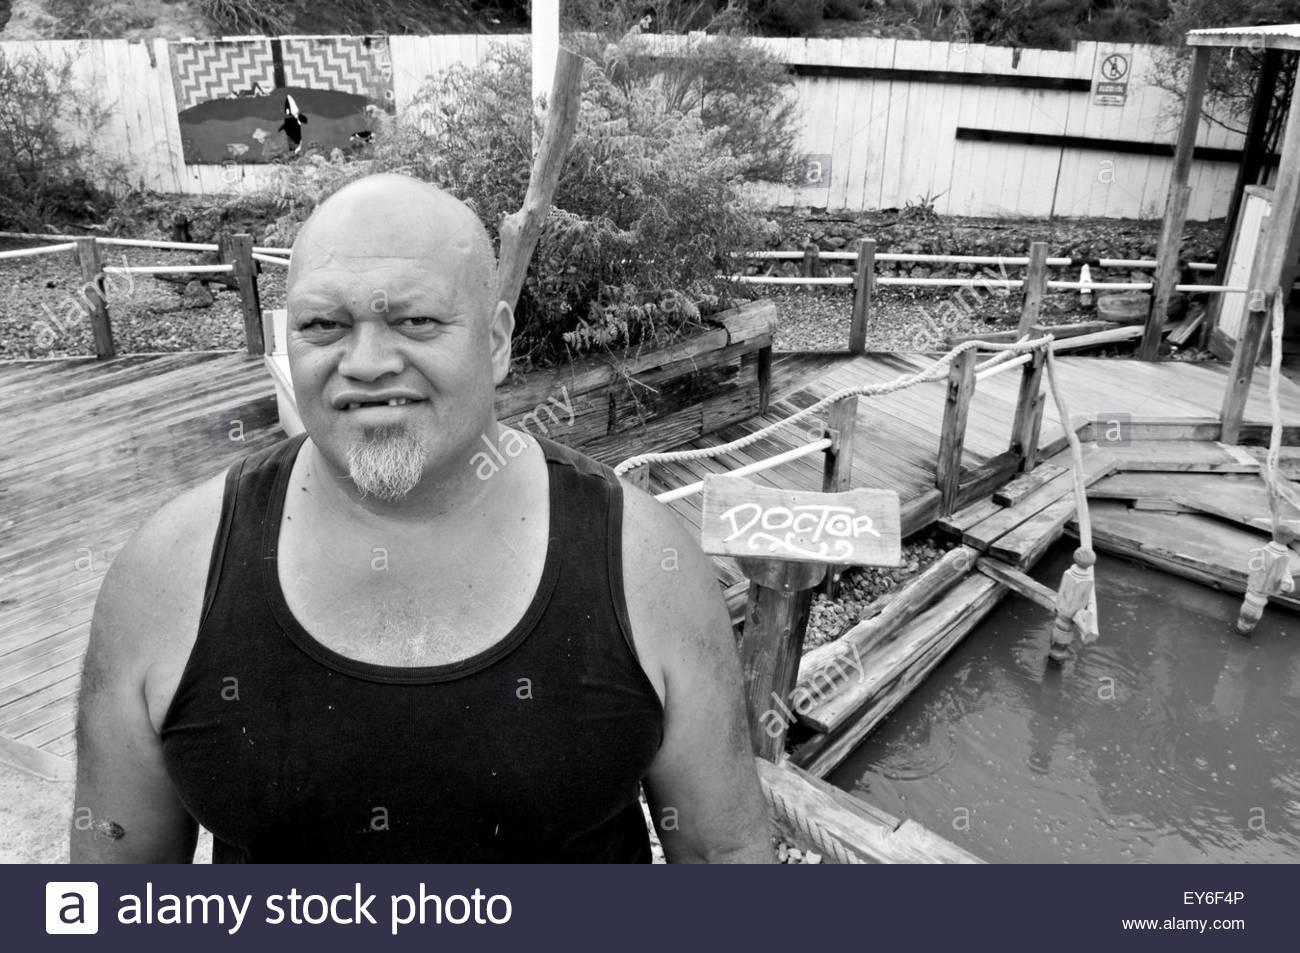 Portrait of Maori gatekeeper in Ngawha Hot Springs spa, Northland, North Island, New Zealand - Stock Image